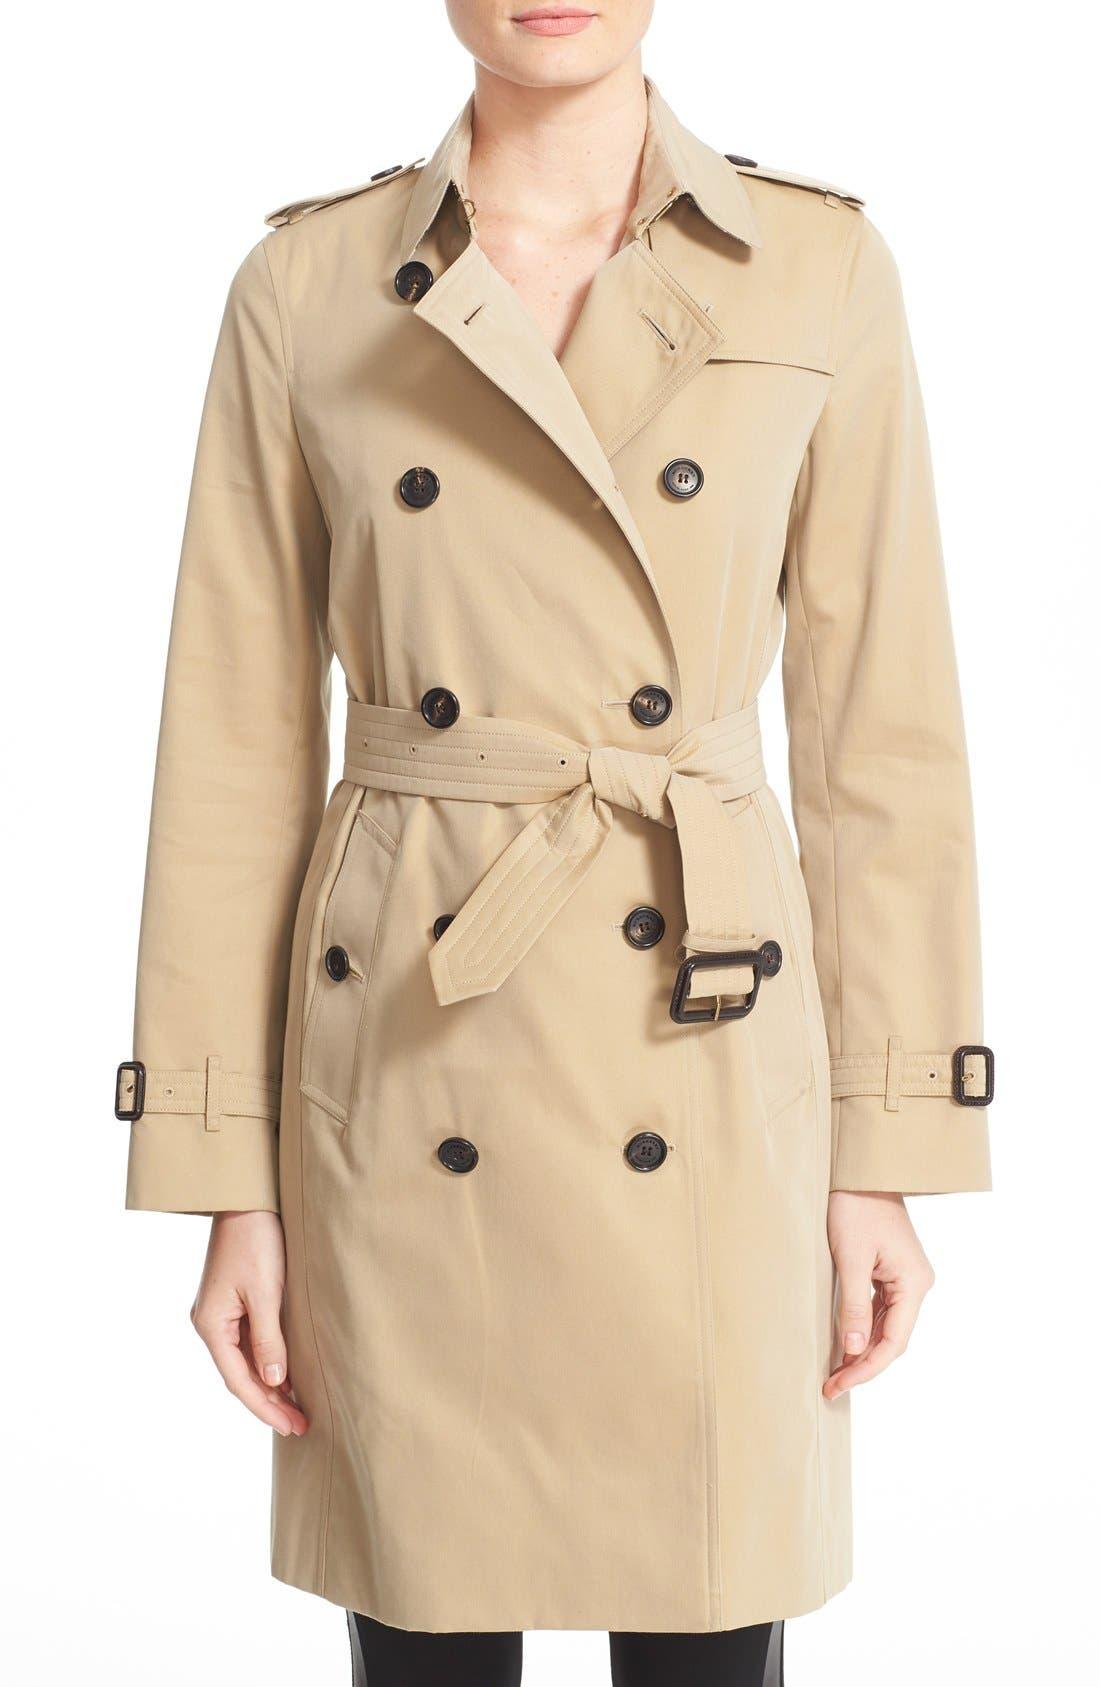 Kensington Long Trench Coat,                         Main,                         color, Honey